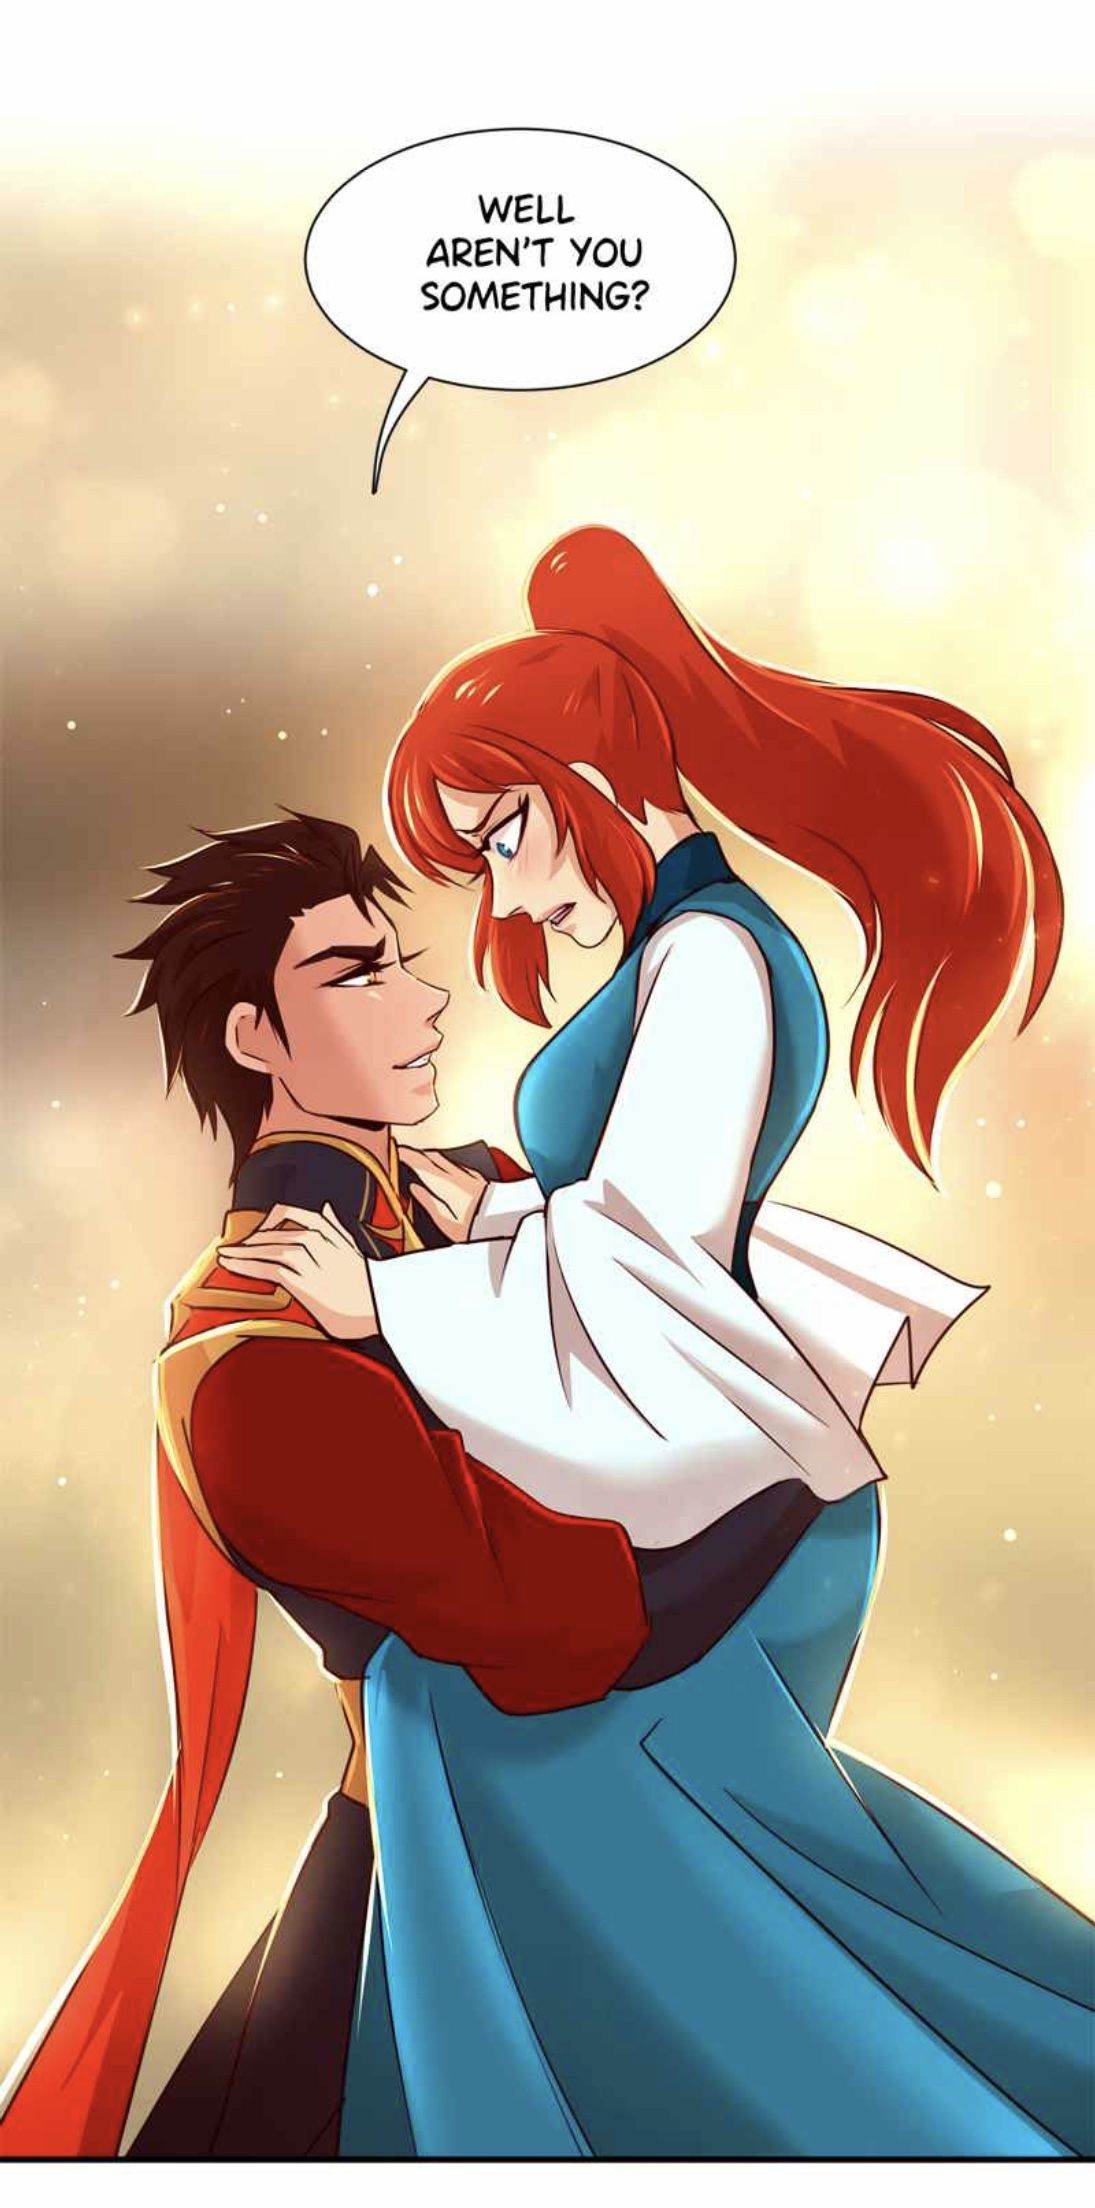 Isn't she? (With images) Anime, Webtoon, Manga romance